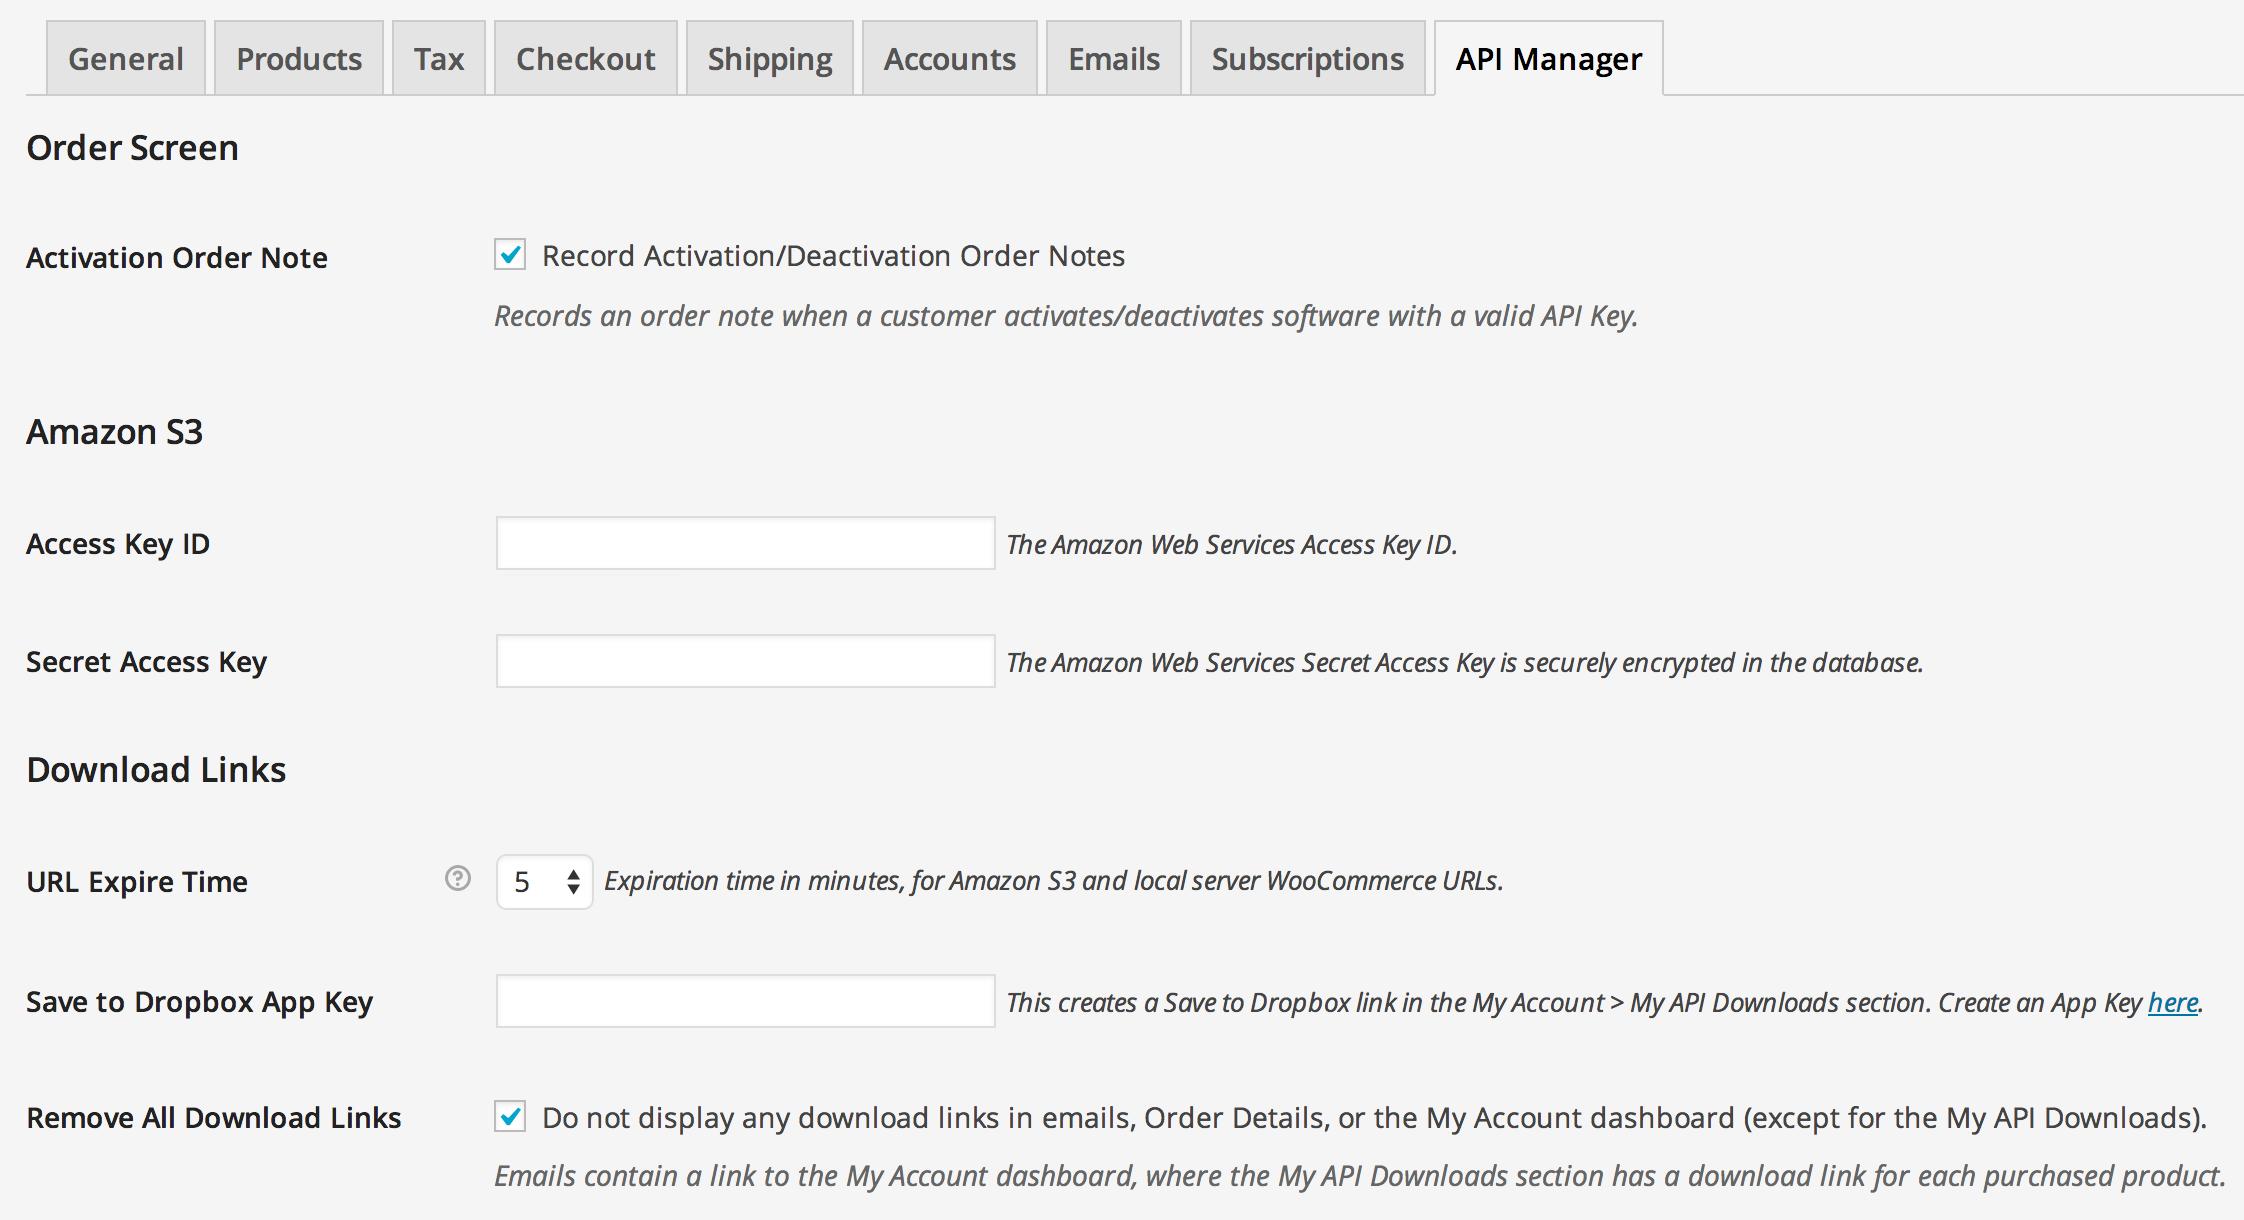 Uk customer account create/downloader - Woocommerce Api Manager Settings